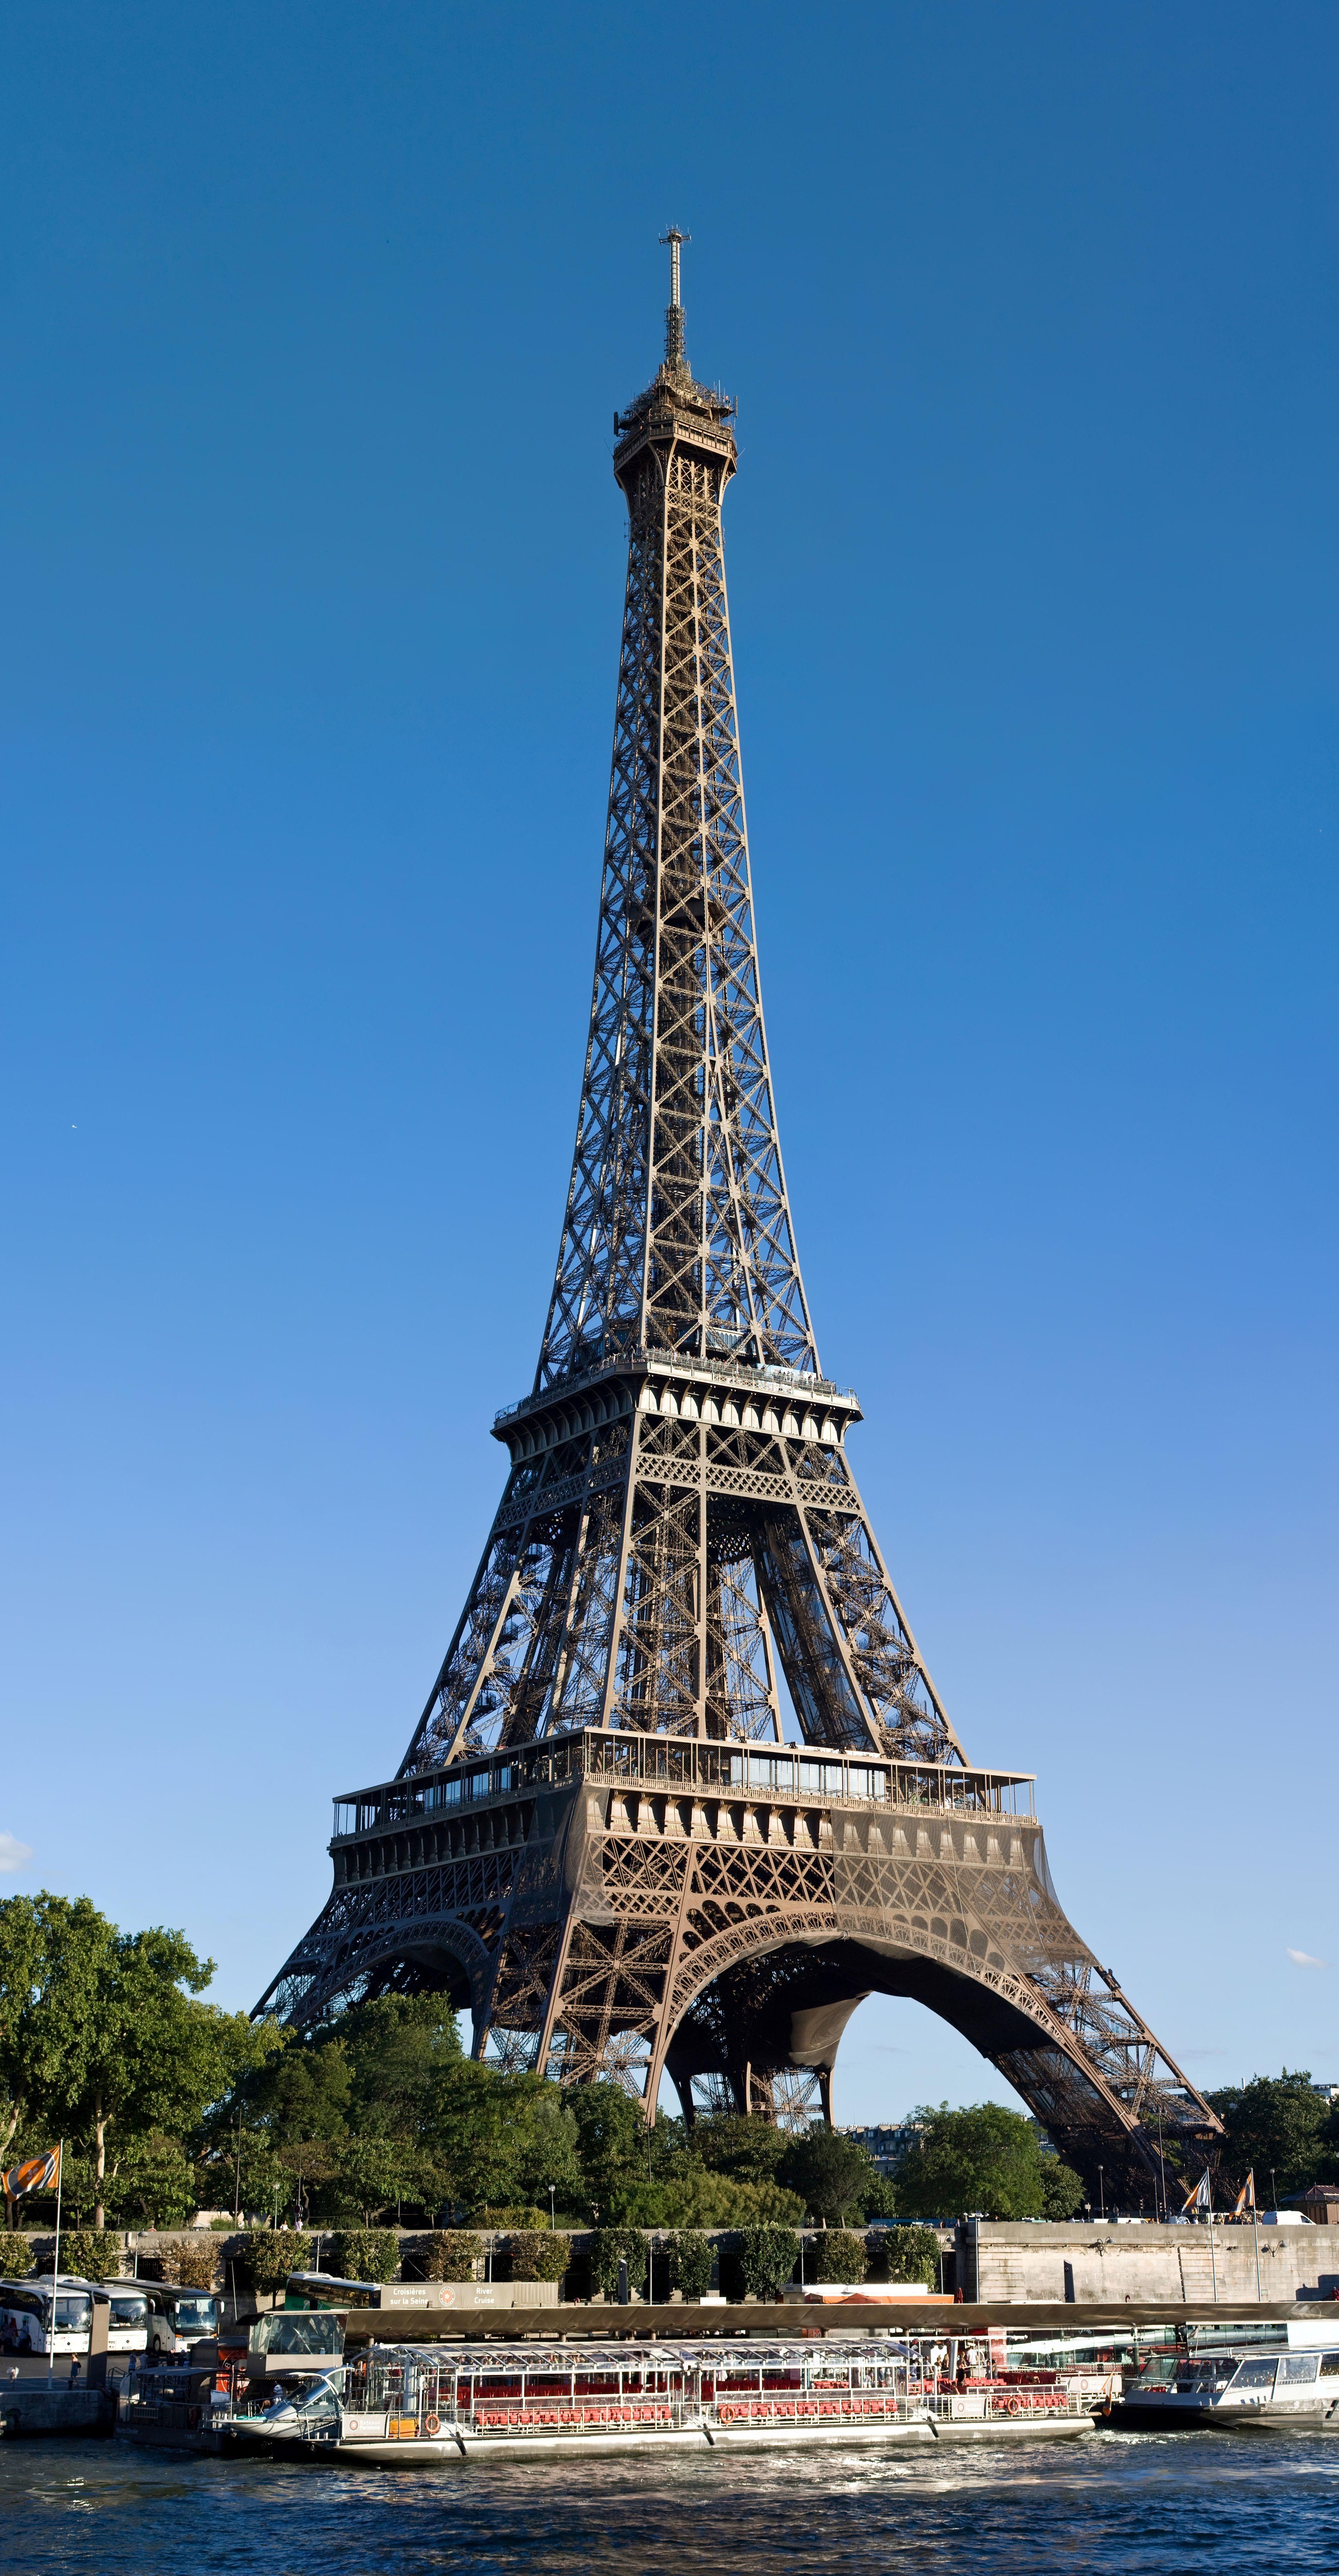 Torre Eiffel Fonte Wikipedia Em Alemao Tour Eiffel Eiffel Tower Tour Eiffel Tower